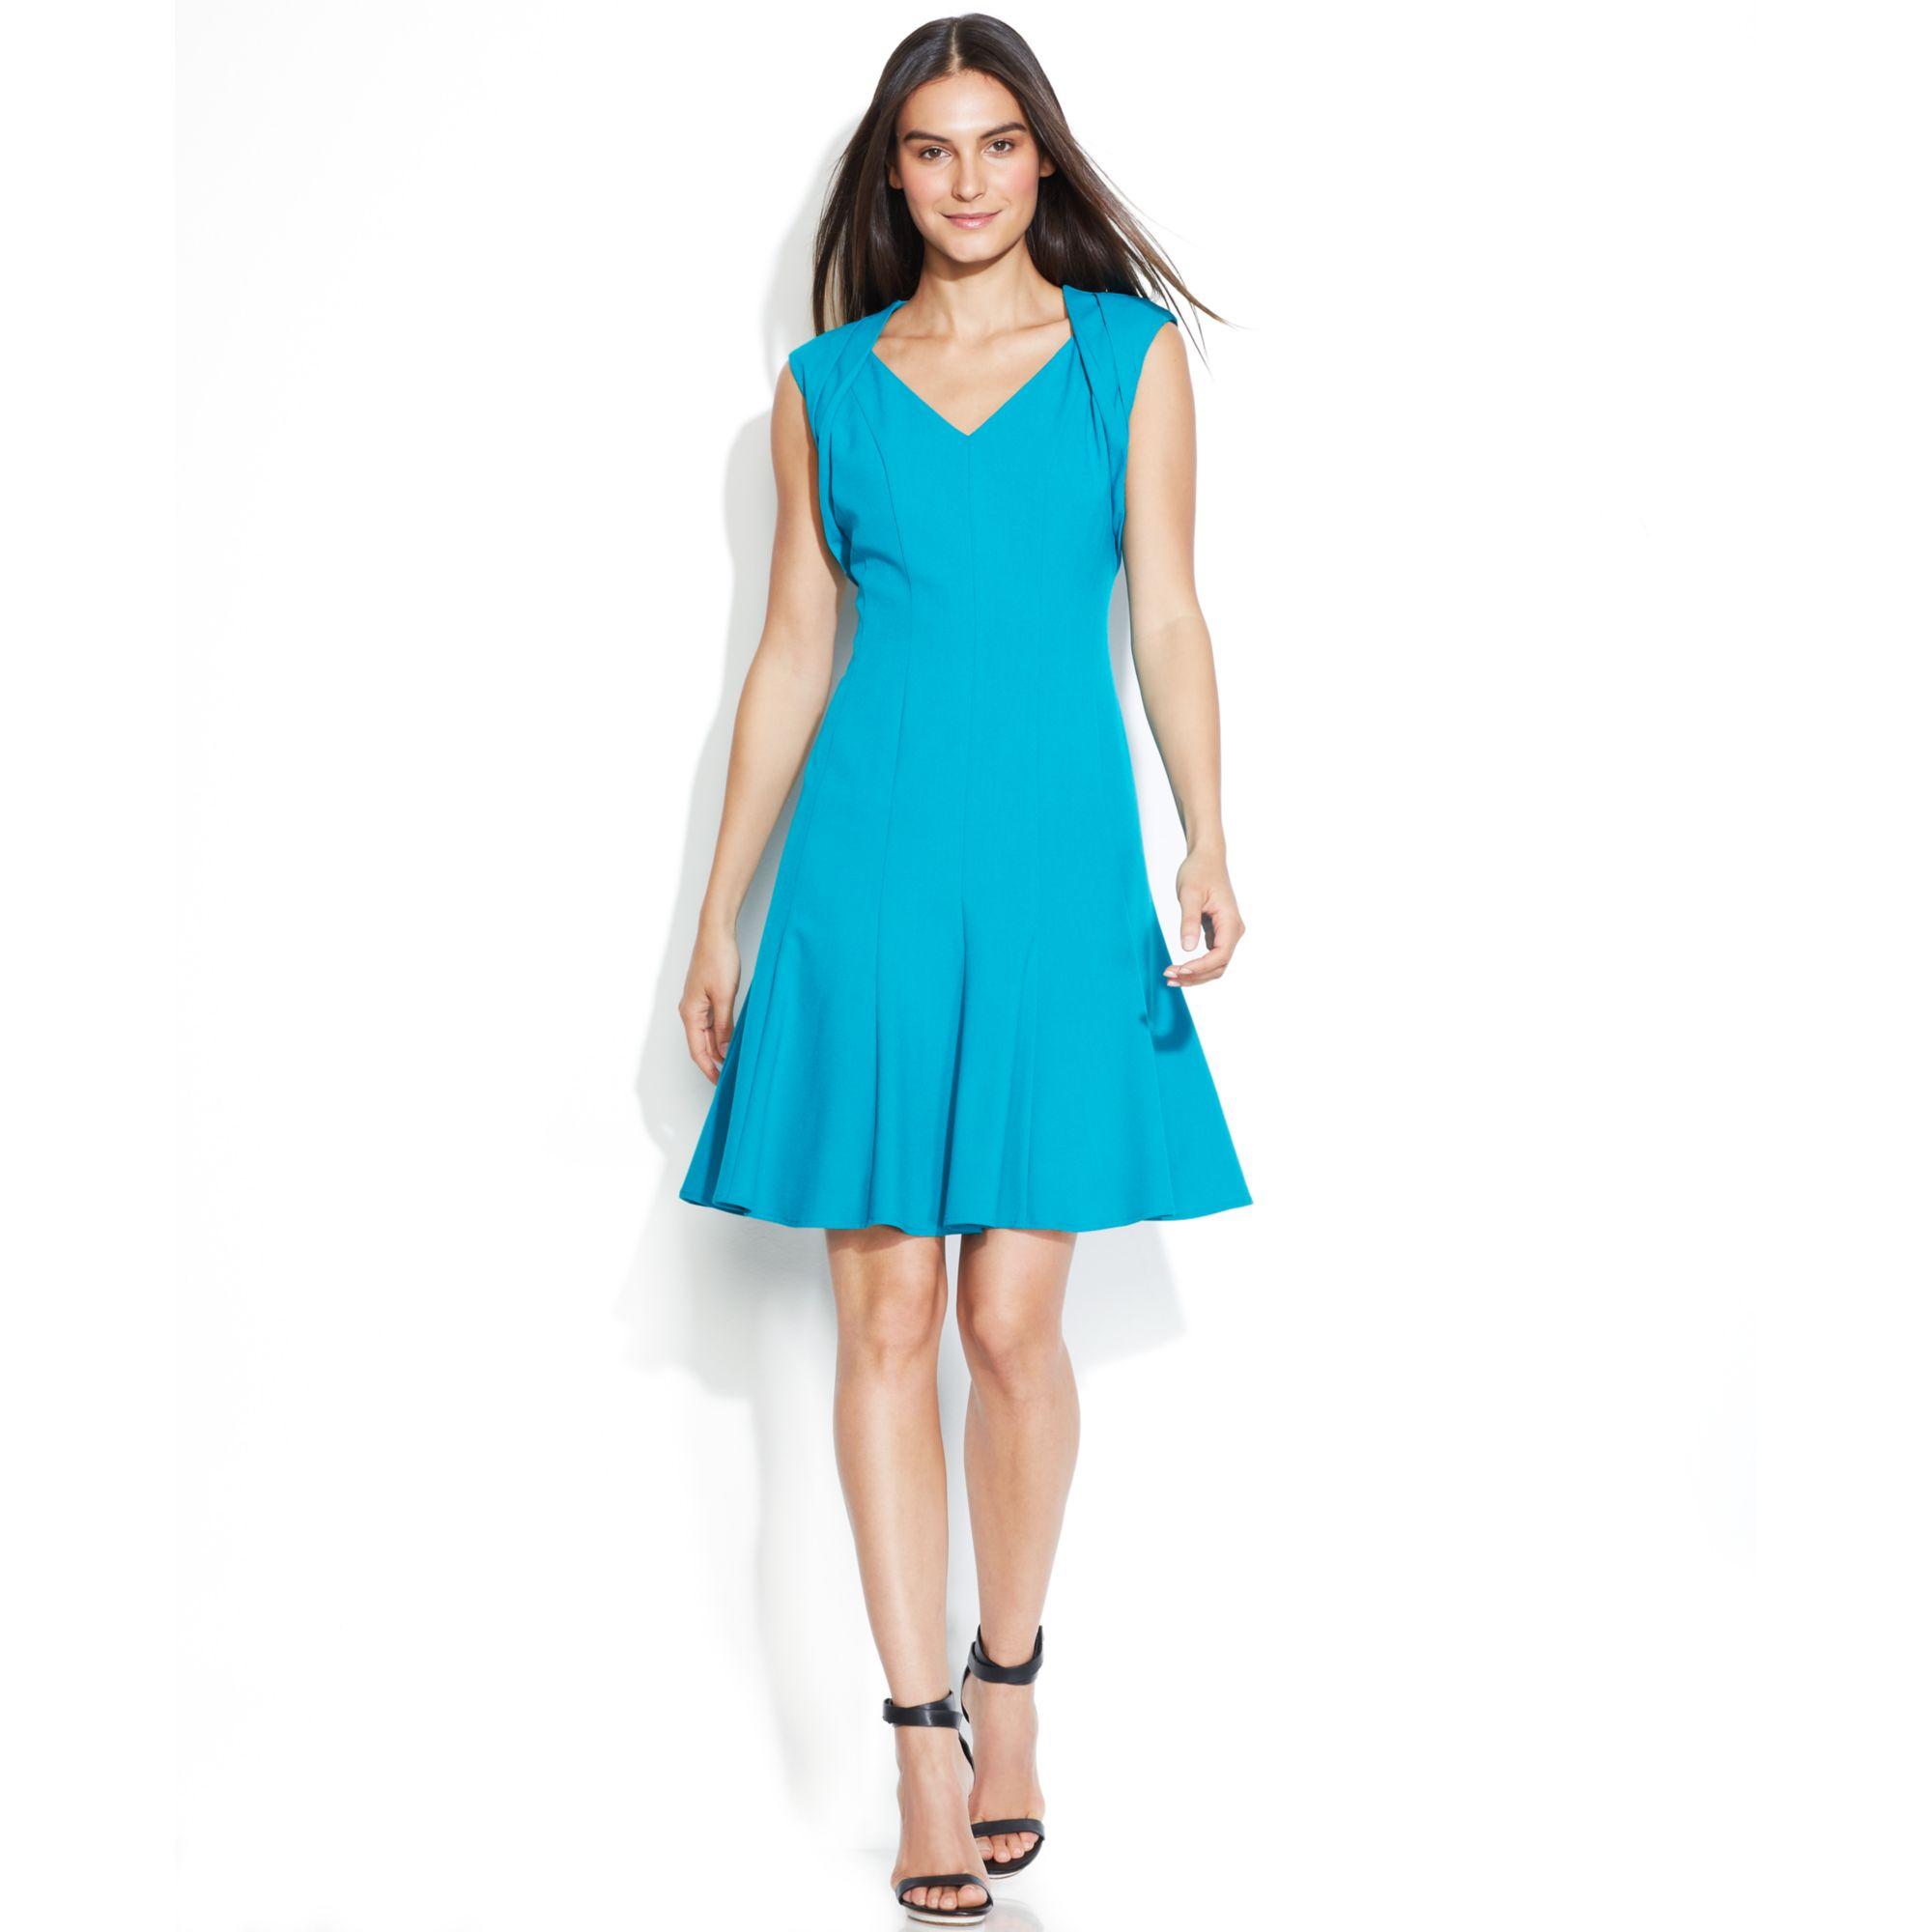 Calvin Klein Blue Dresses | Dress images